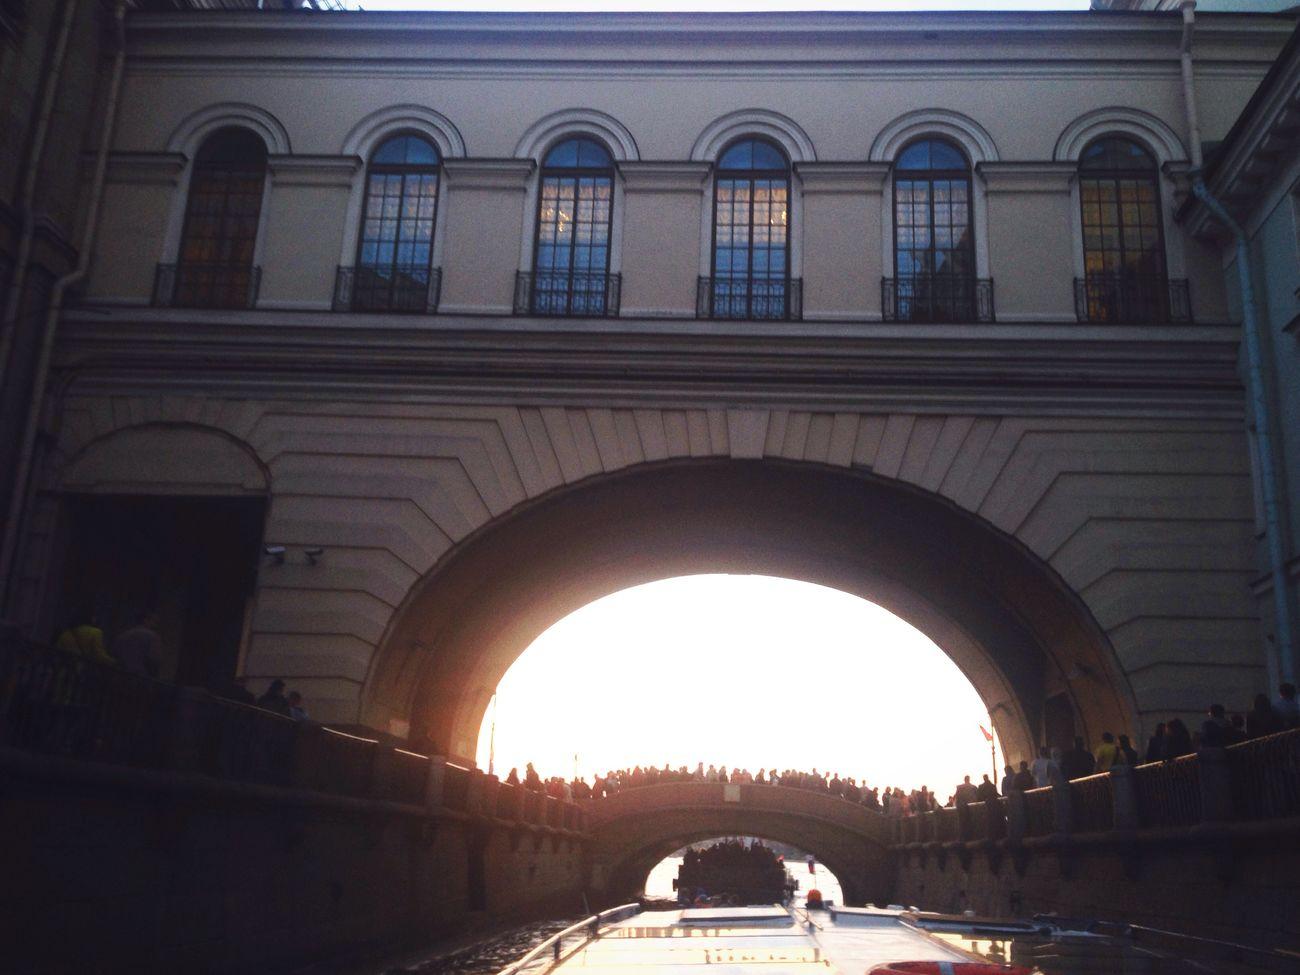 Saint Petersburg Санкт-Петербург Russia Rusya нева Nehir River Kopru Bridge Sunset Gunbatimi